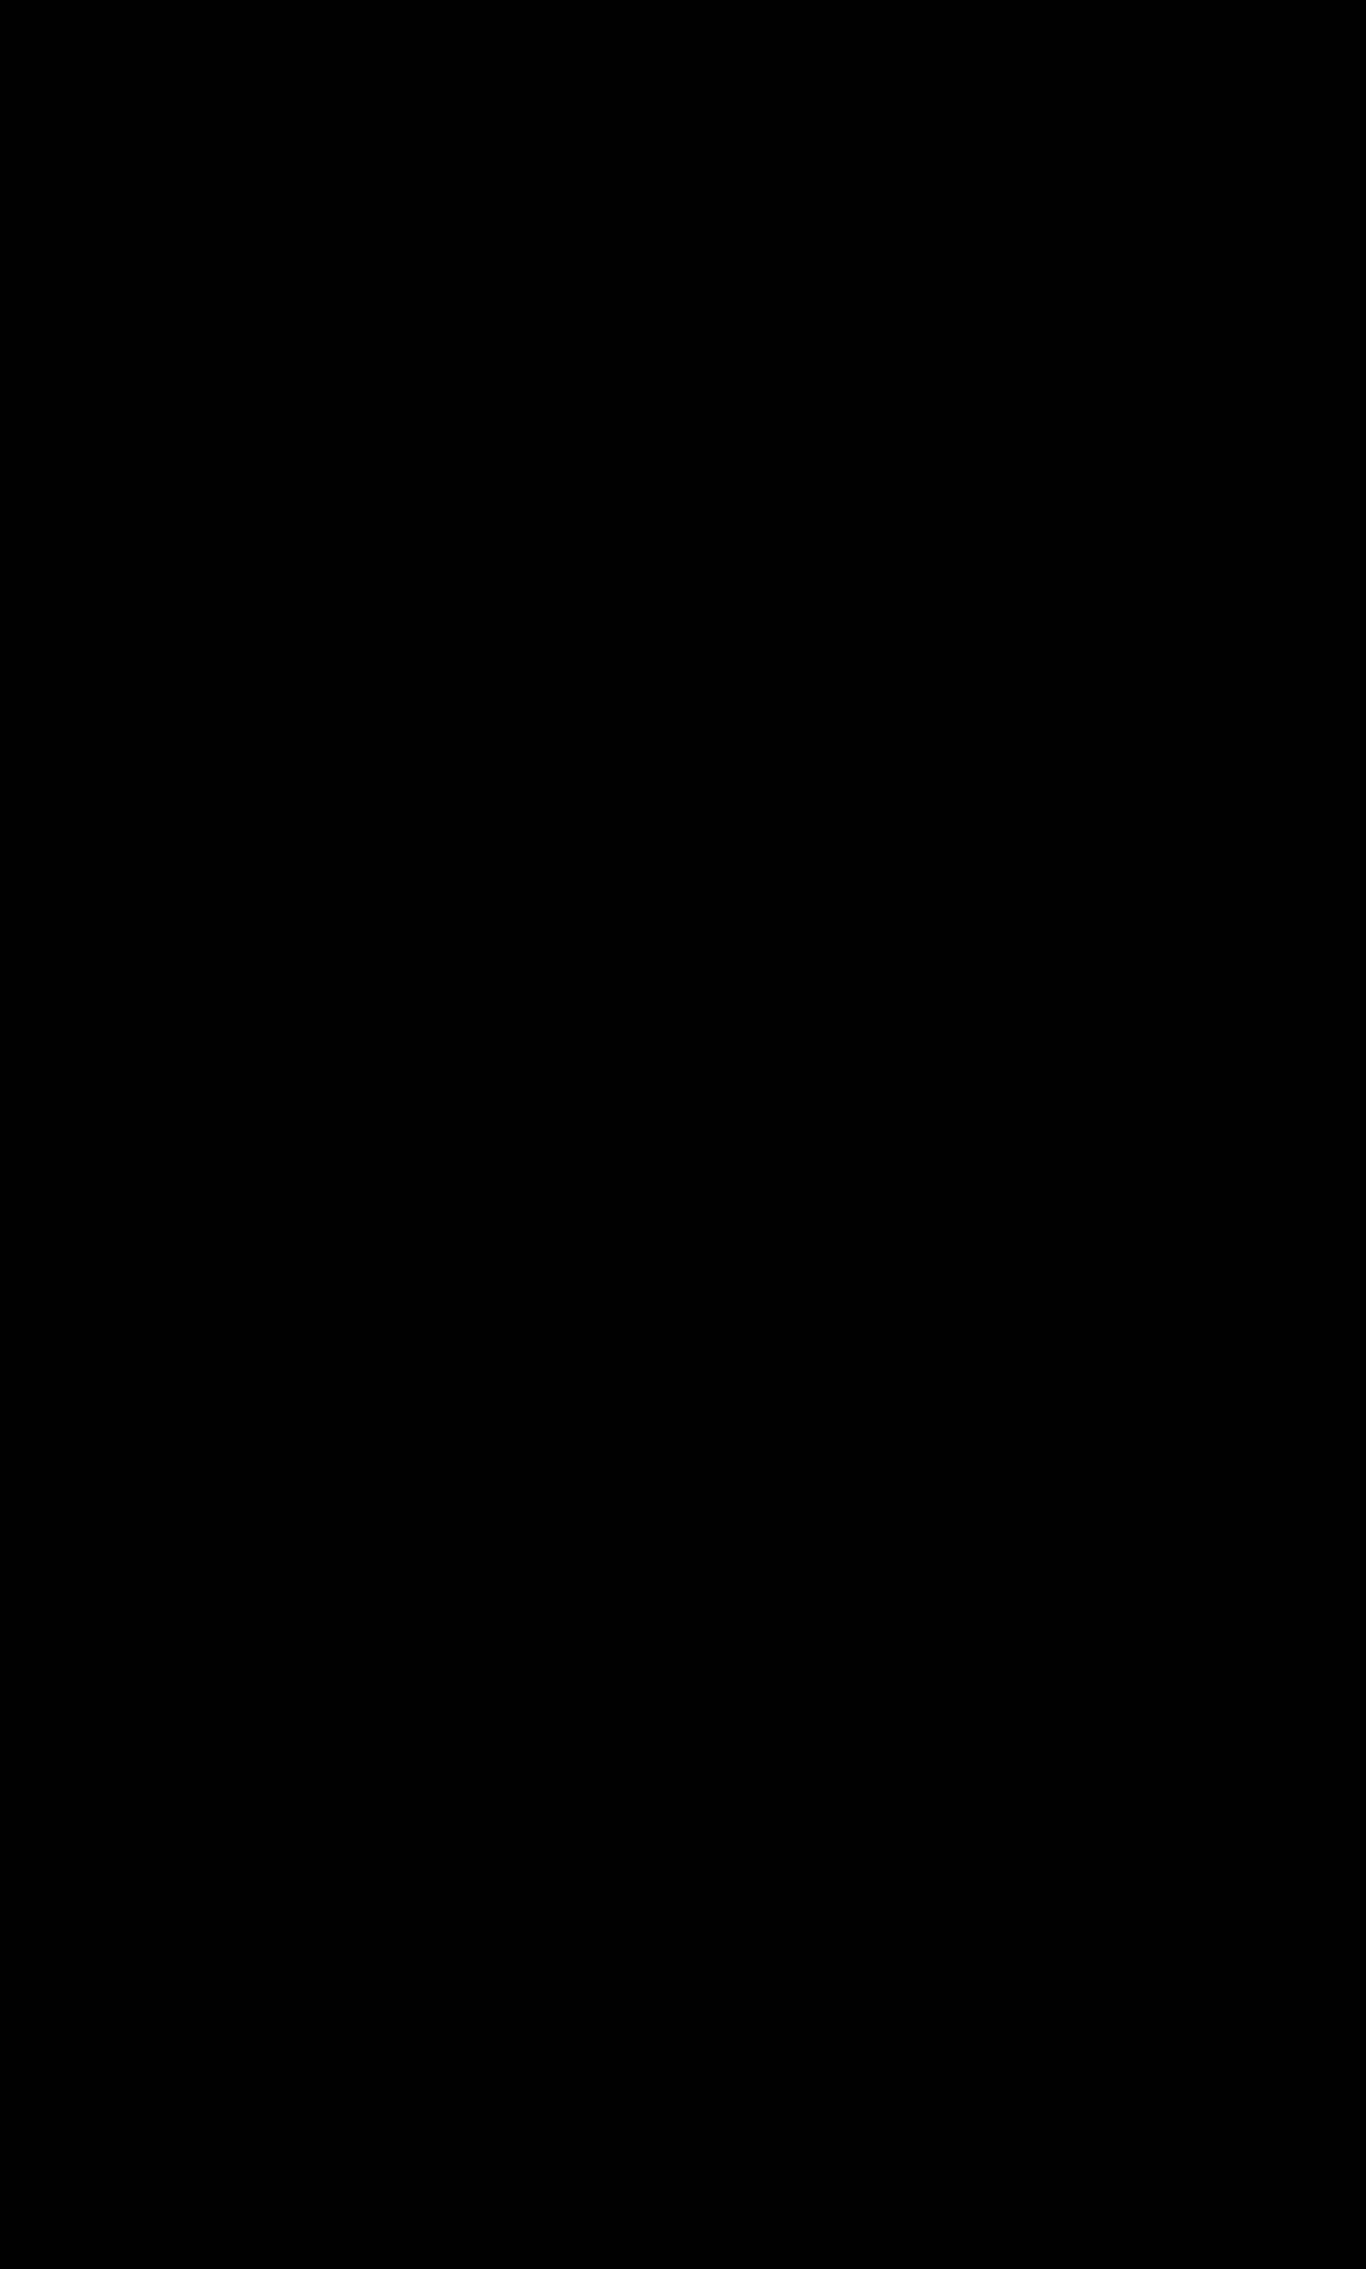 1366x2269 Clipart